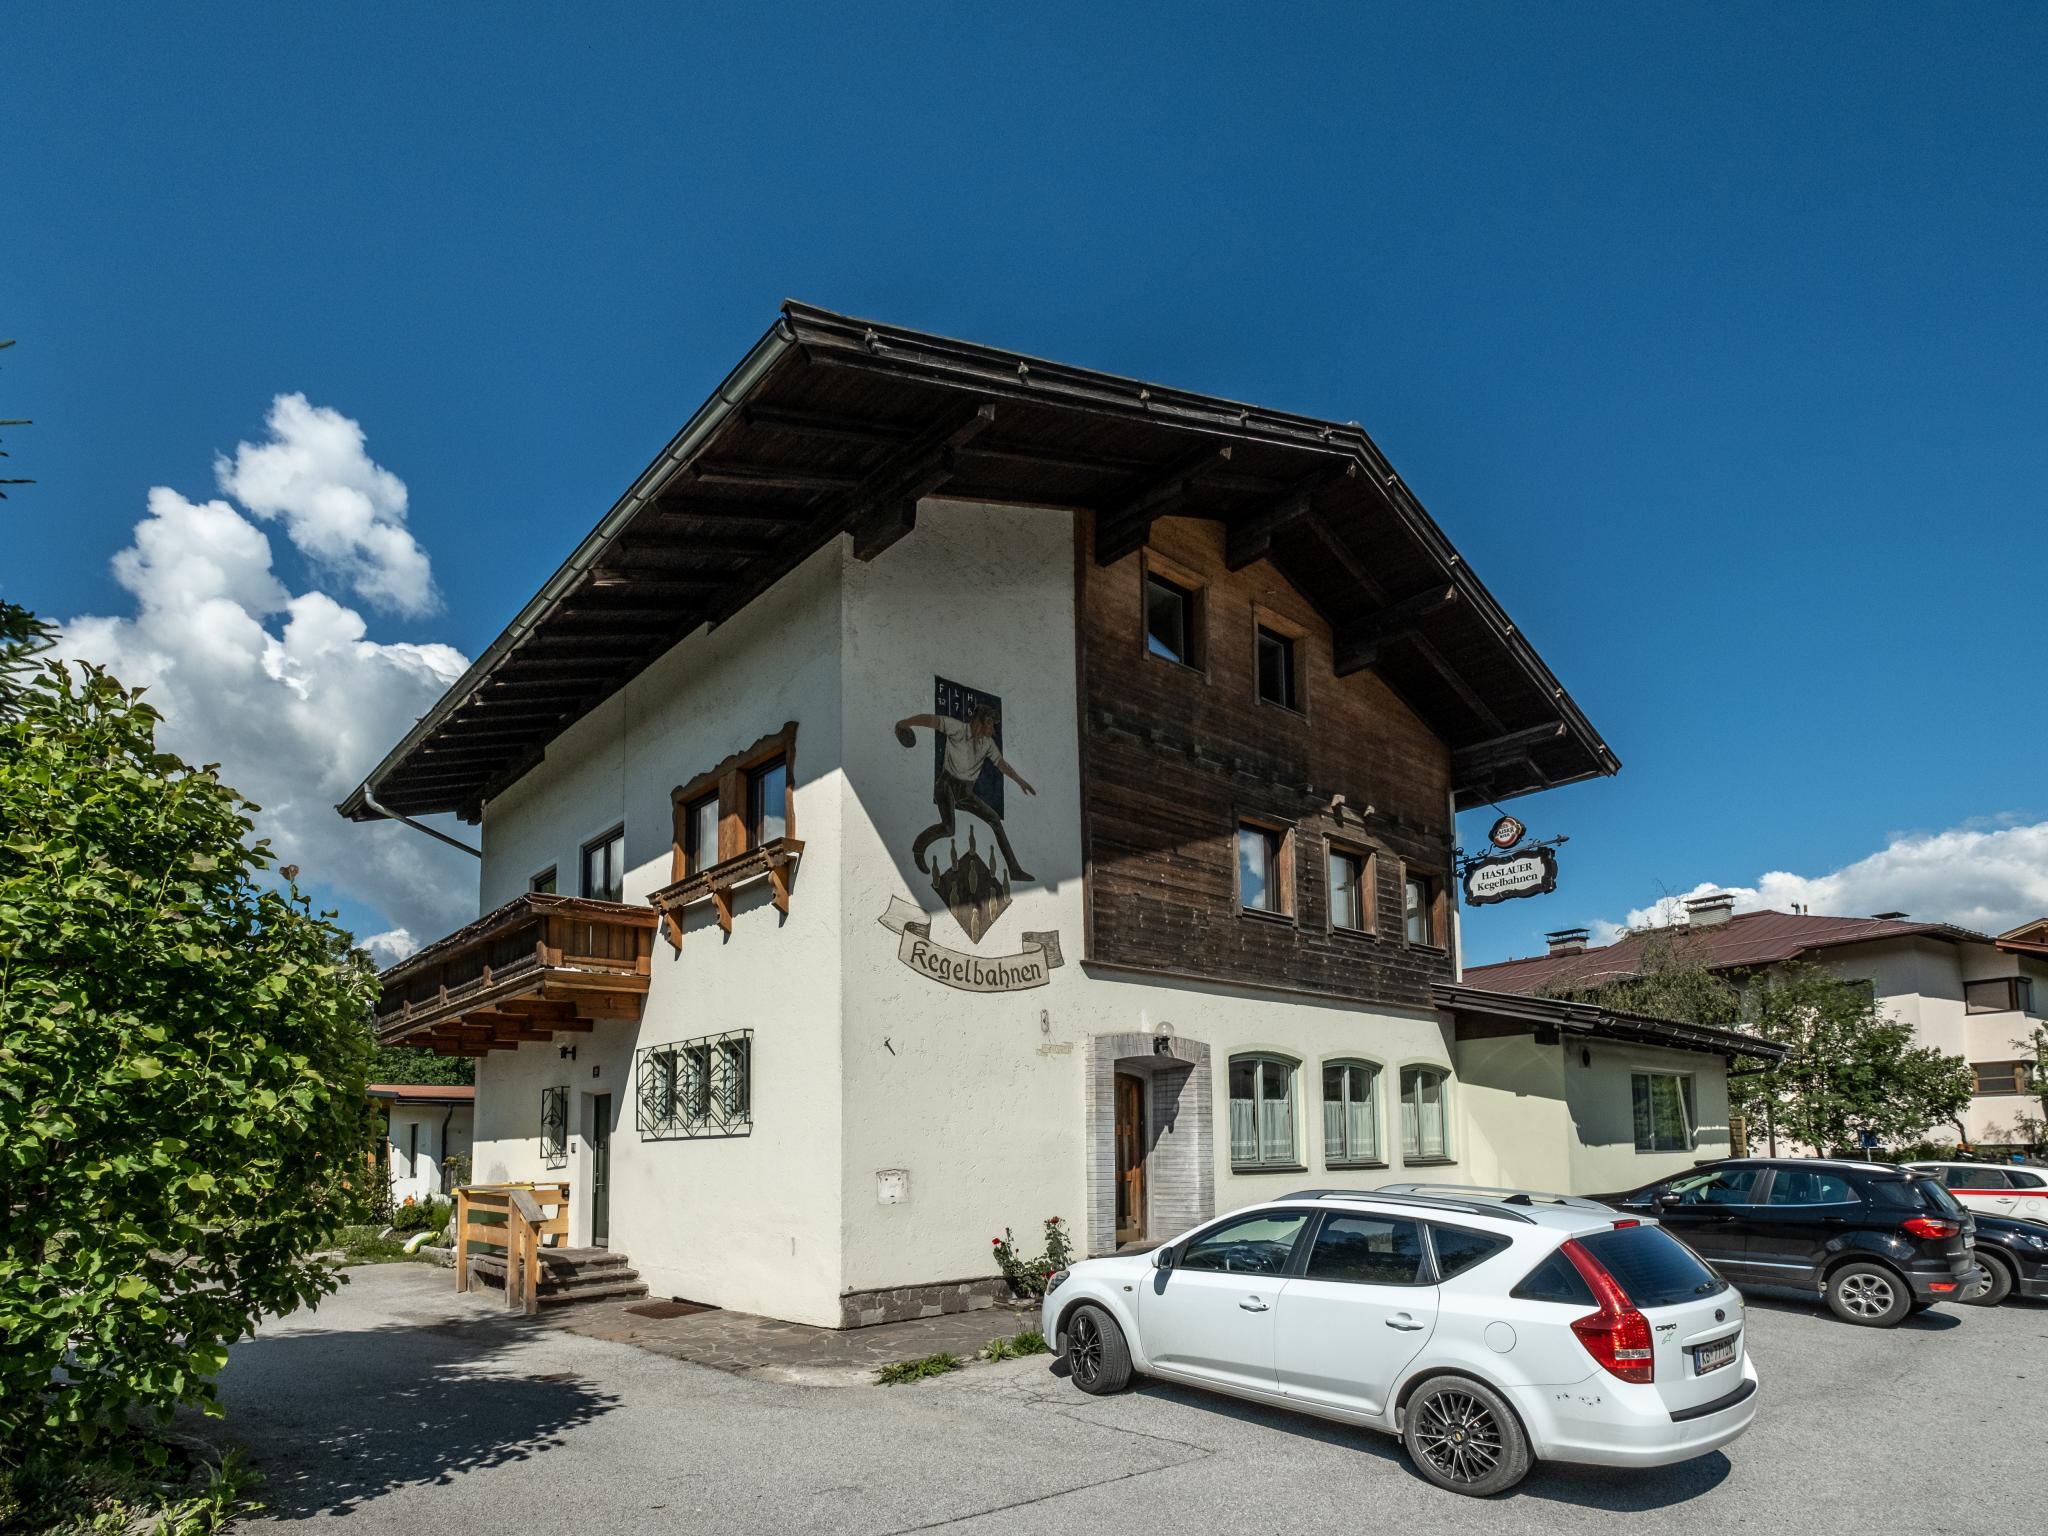 Haslau Large Tirol